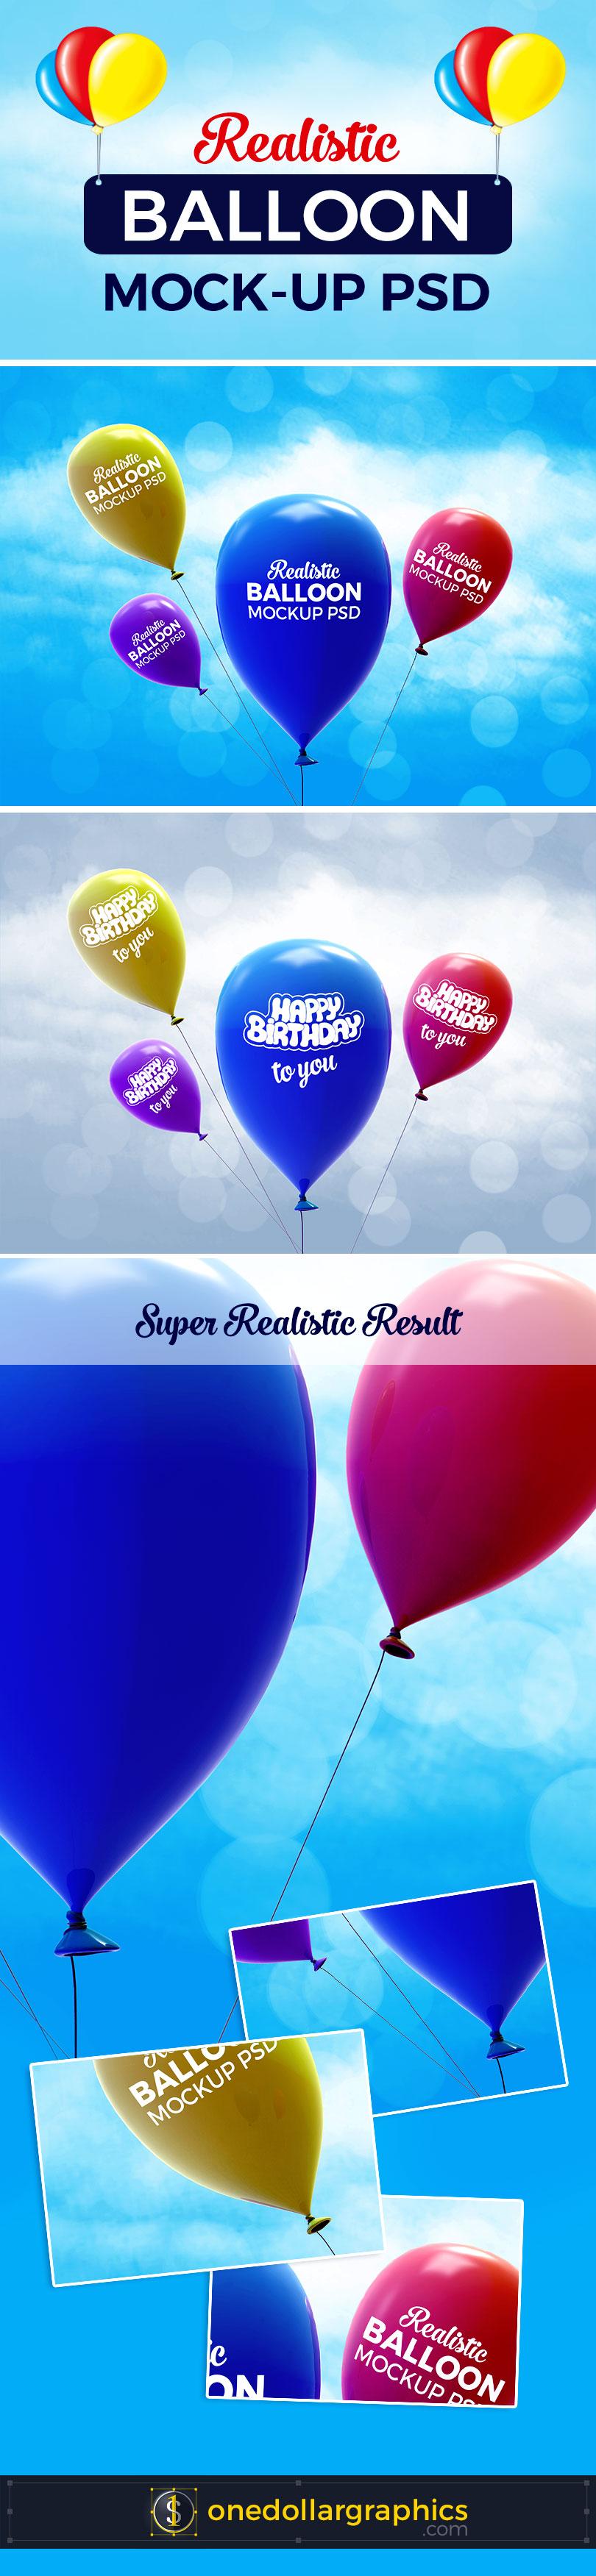 Realistic-Balloon-Mock-up-PSD-(5)